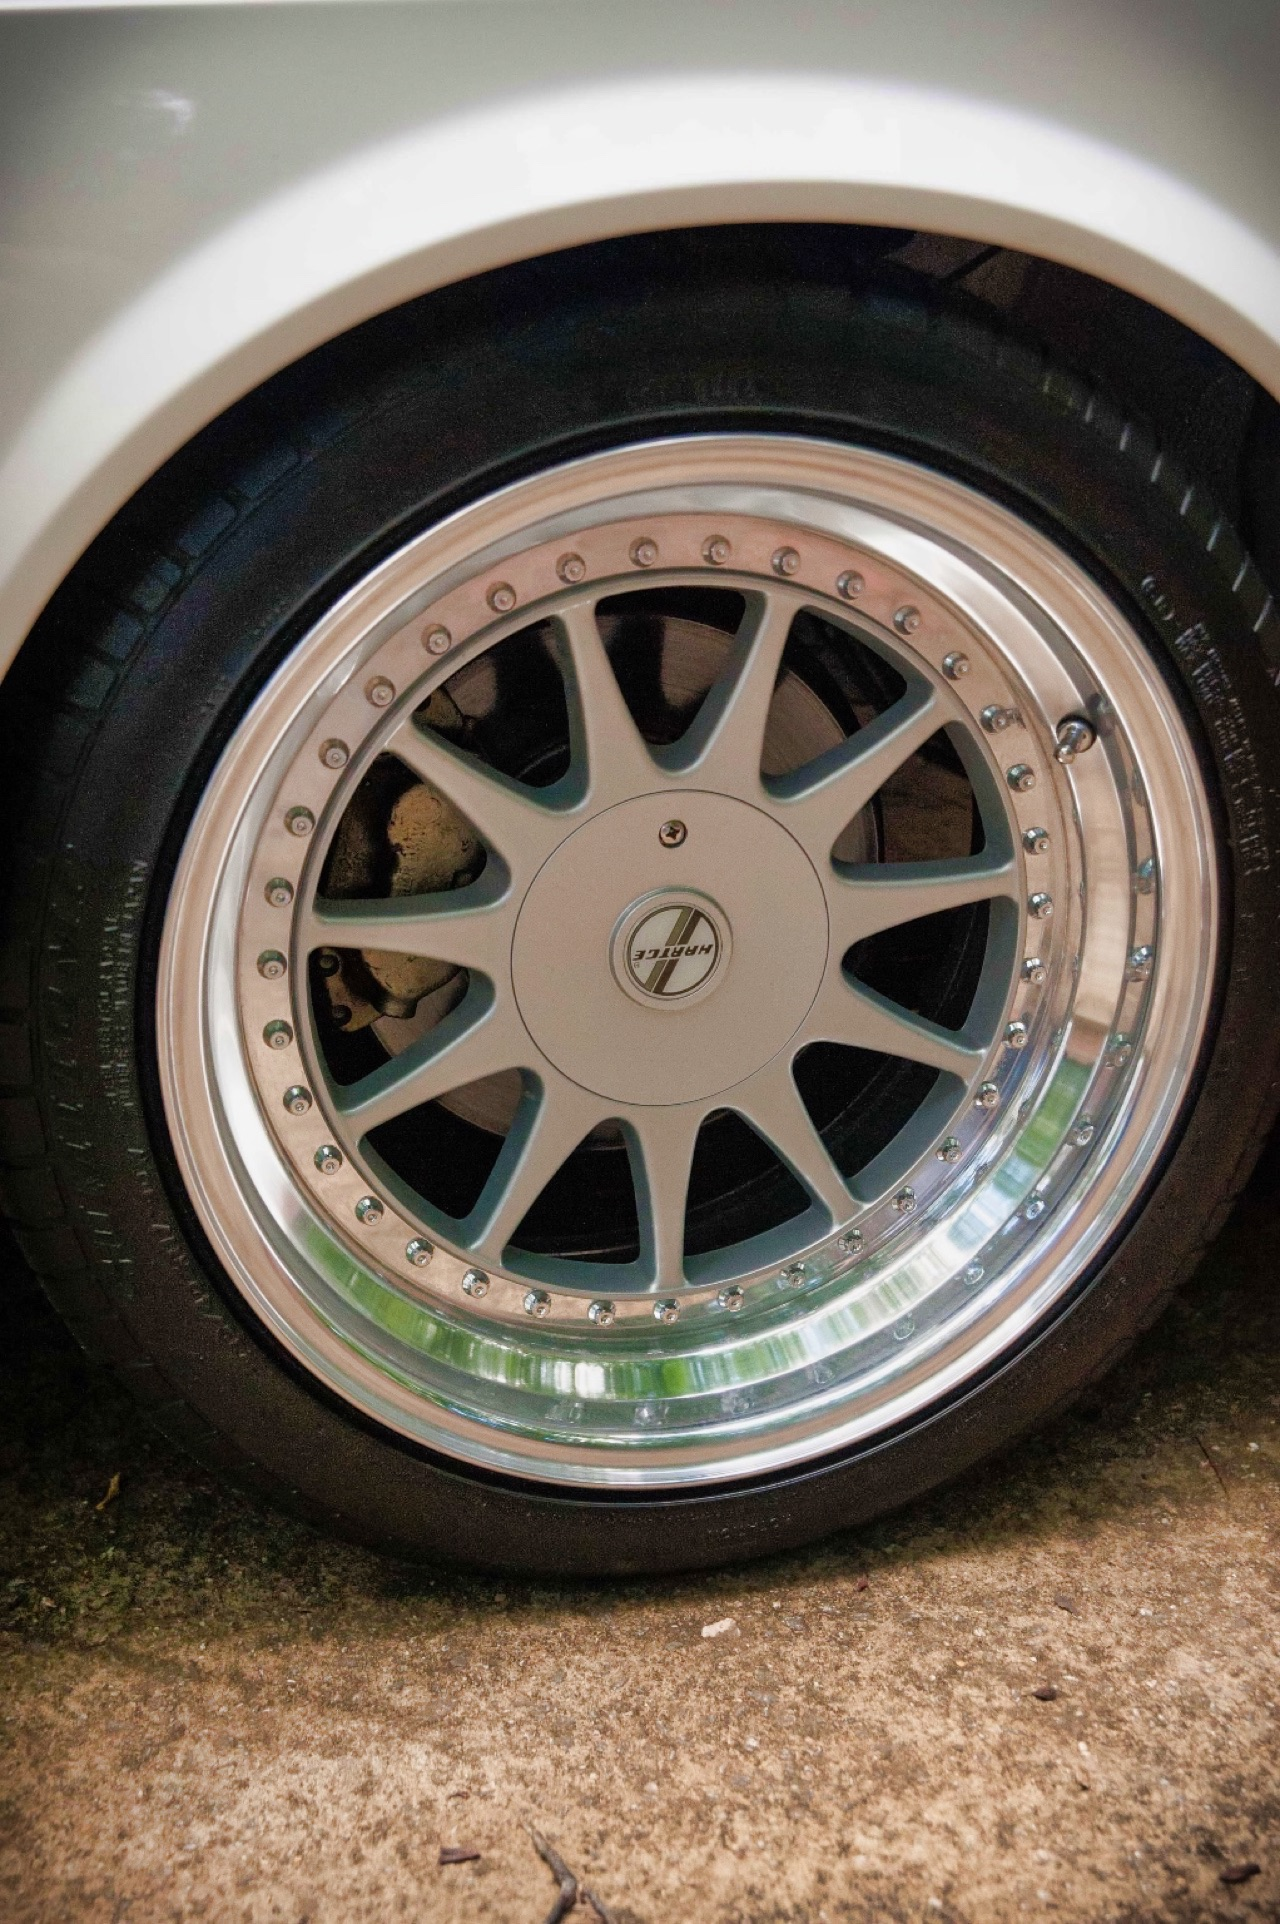 BMW 745i - Première classe Vintage ! 5